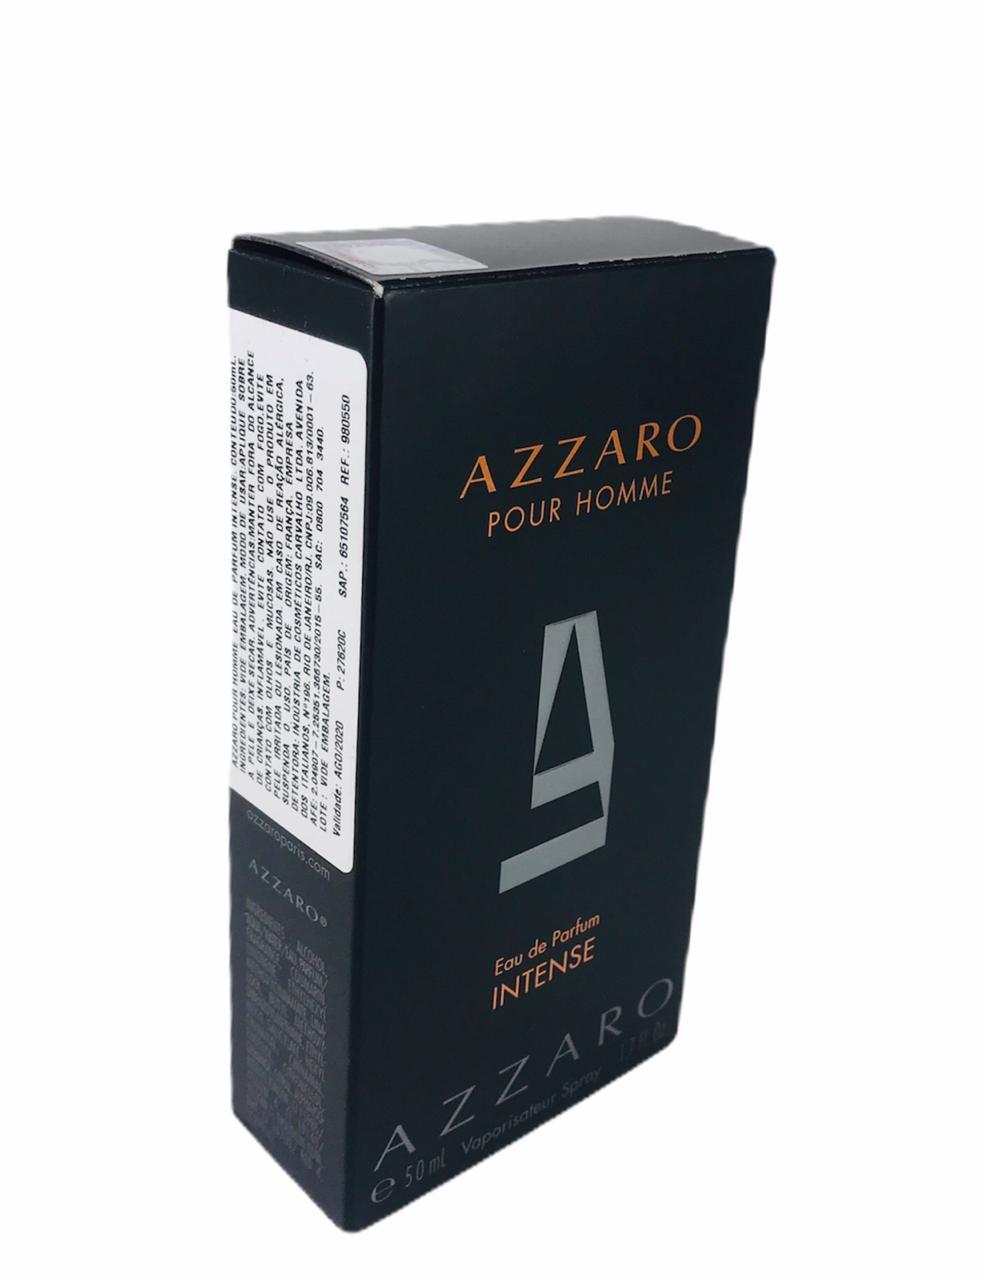 Azzaro Pour Homme Intense Masculino Eau de Parfum 50ml - TESTER